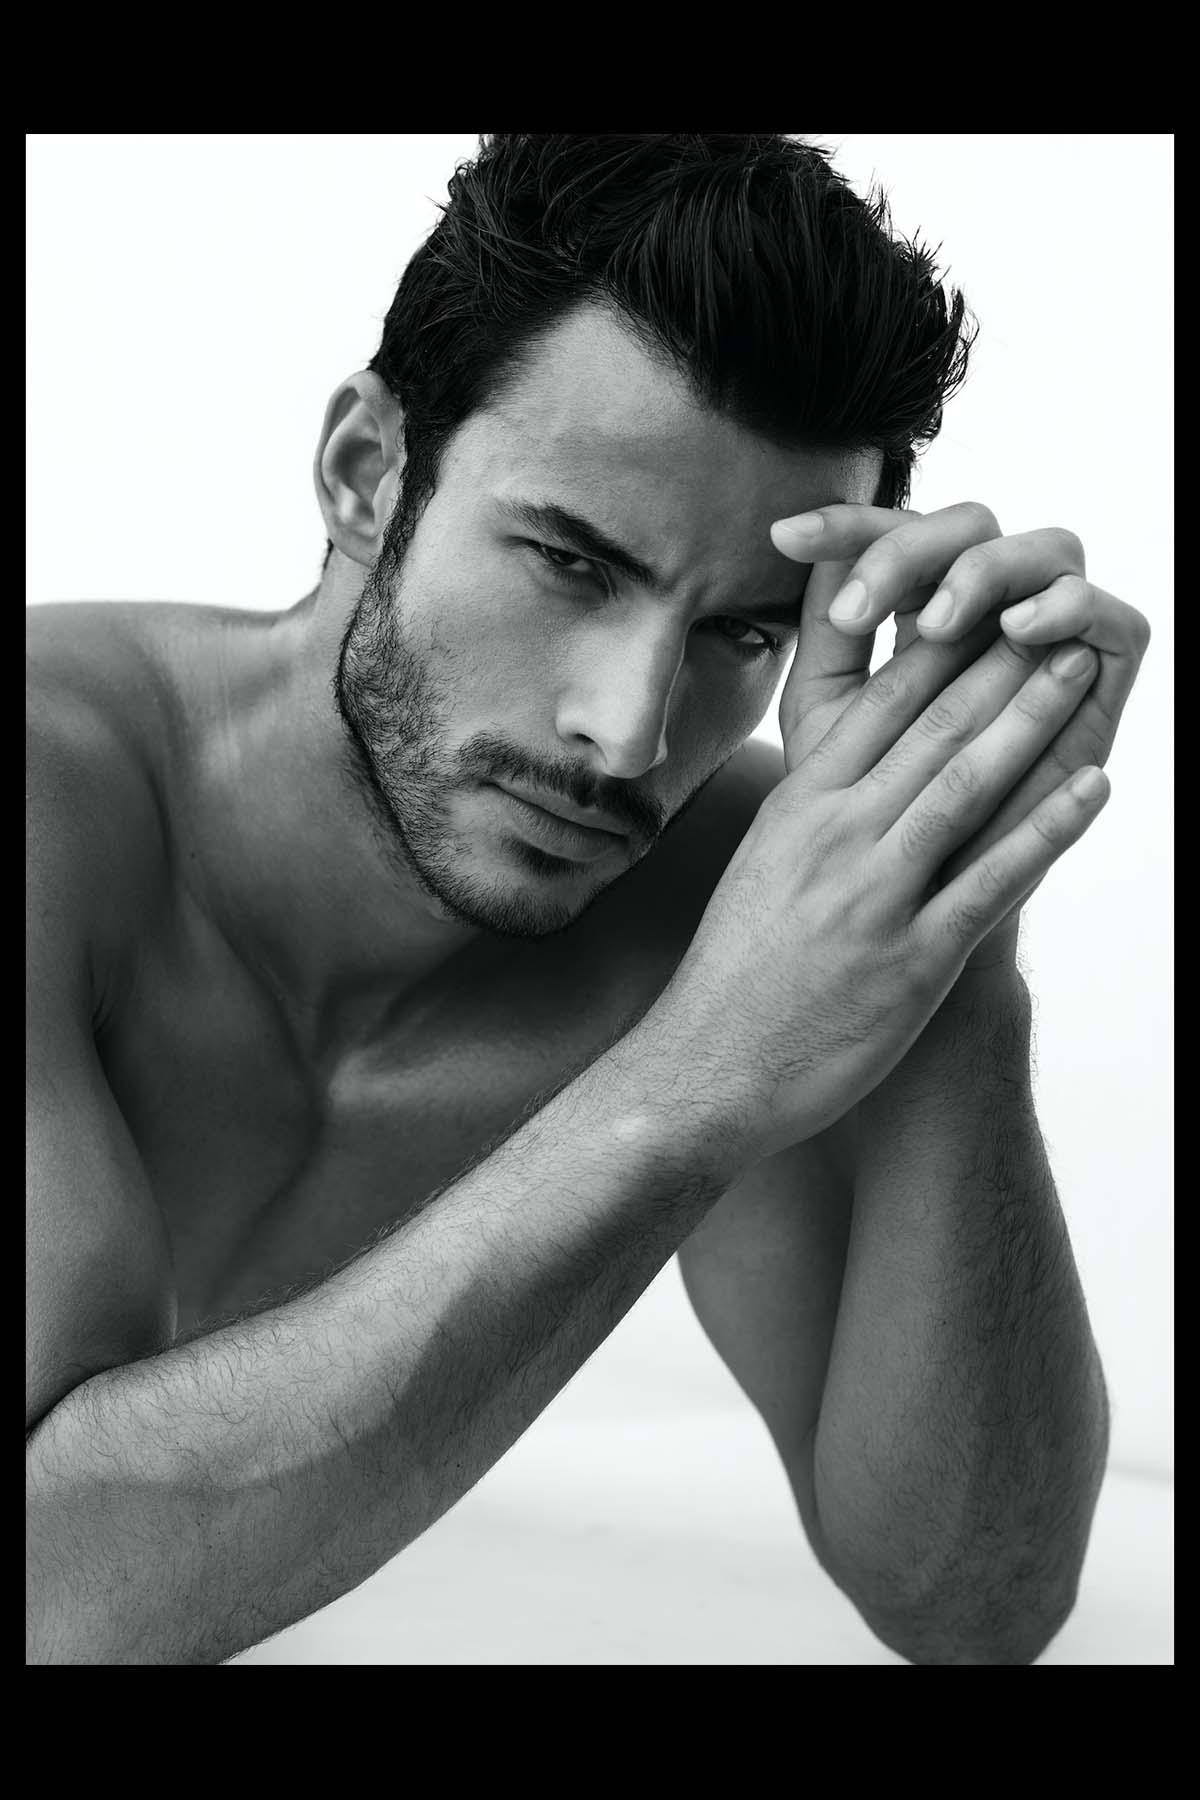 ENSAIO: Renato Freitas por Wong Sim para Brazilian Male Model